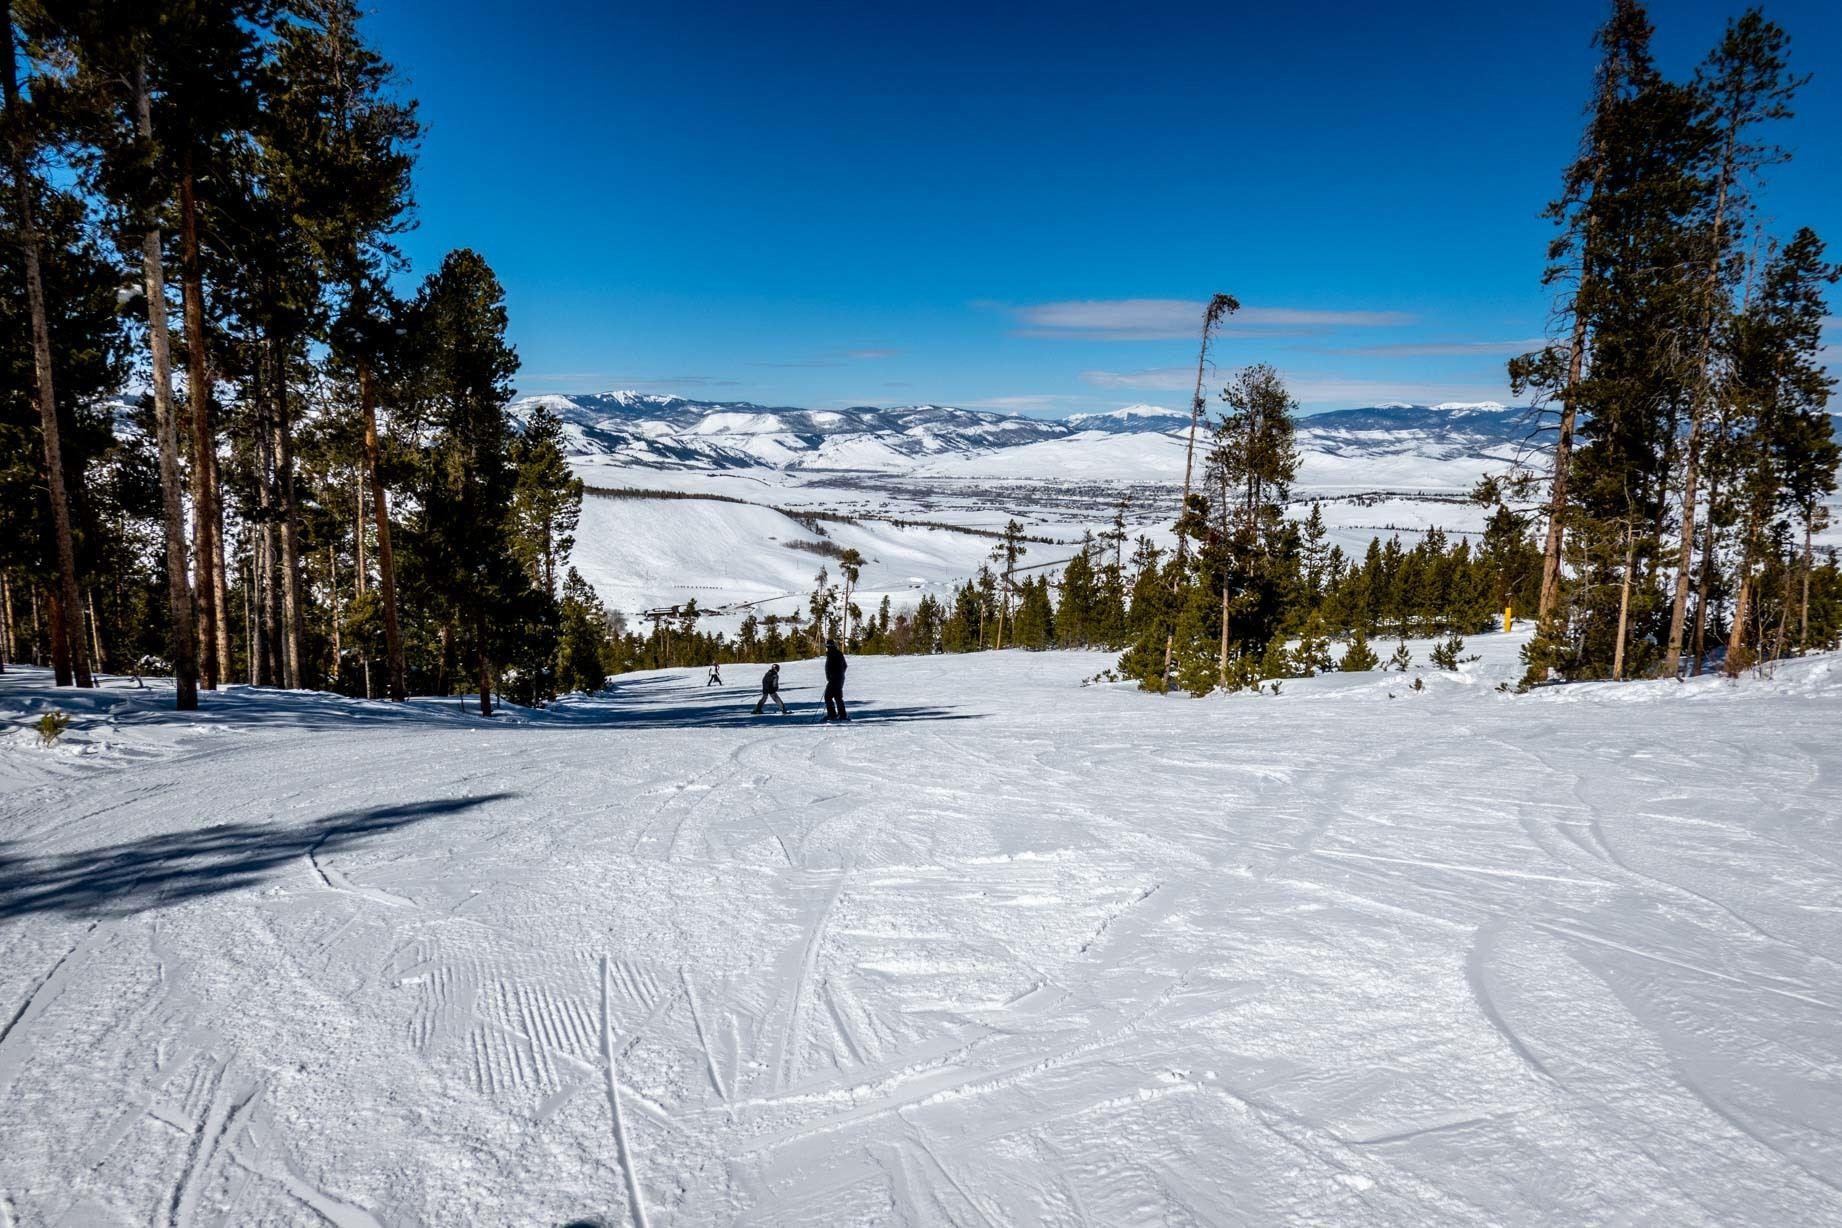 View down a ski run at Granby Mountain Ranch ski area